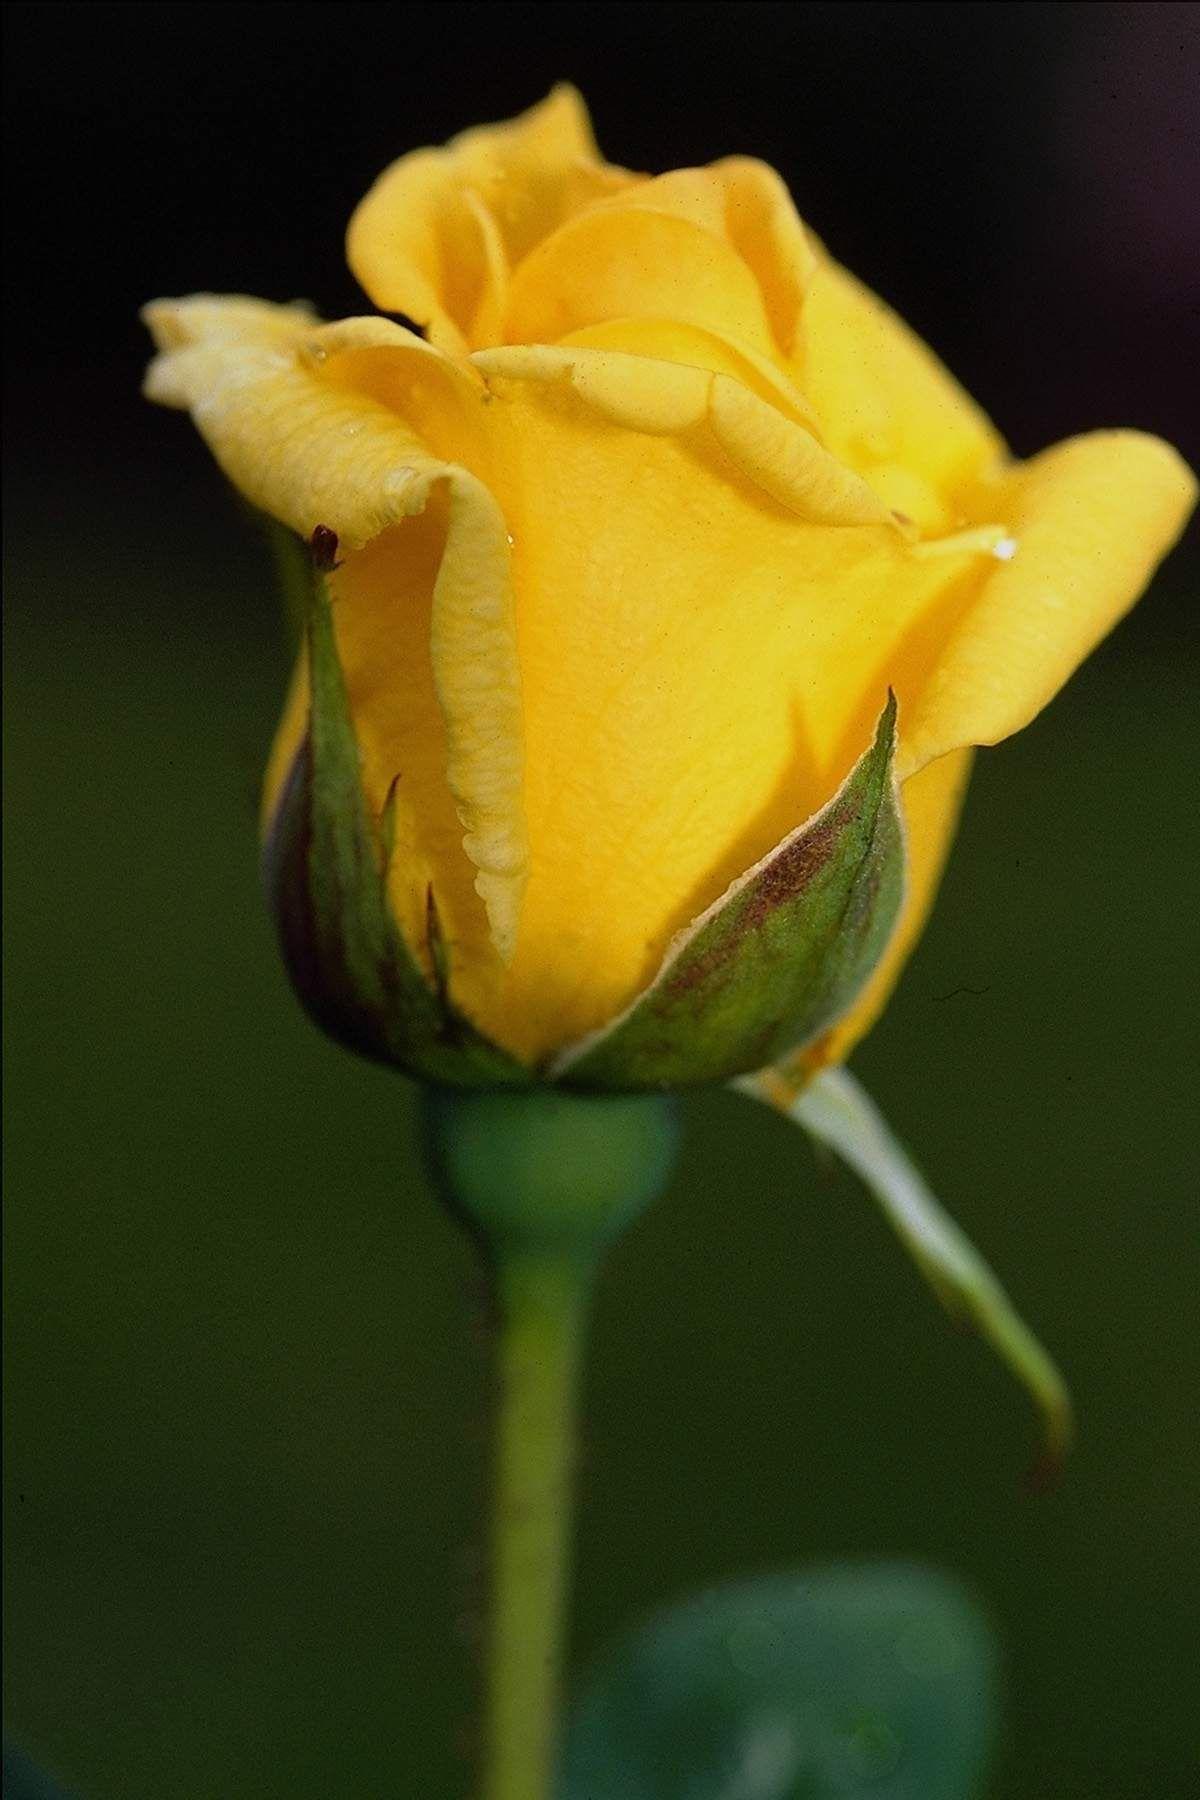 Hd wallpaper yellow rose - Yellow Rose